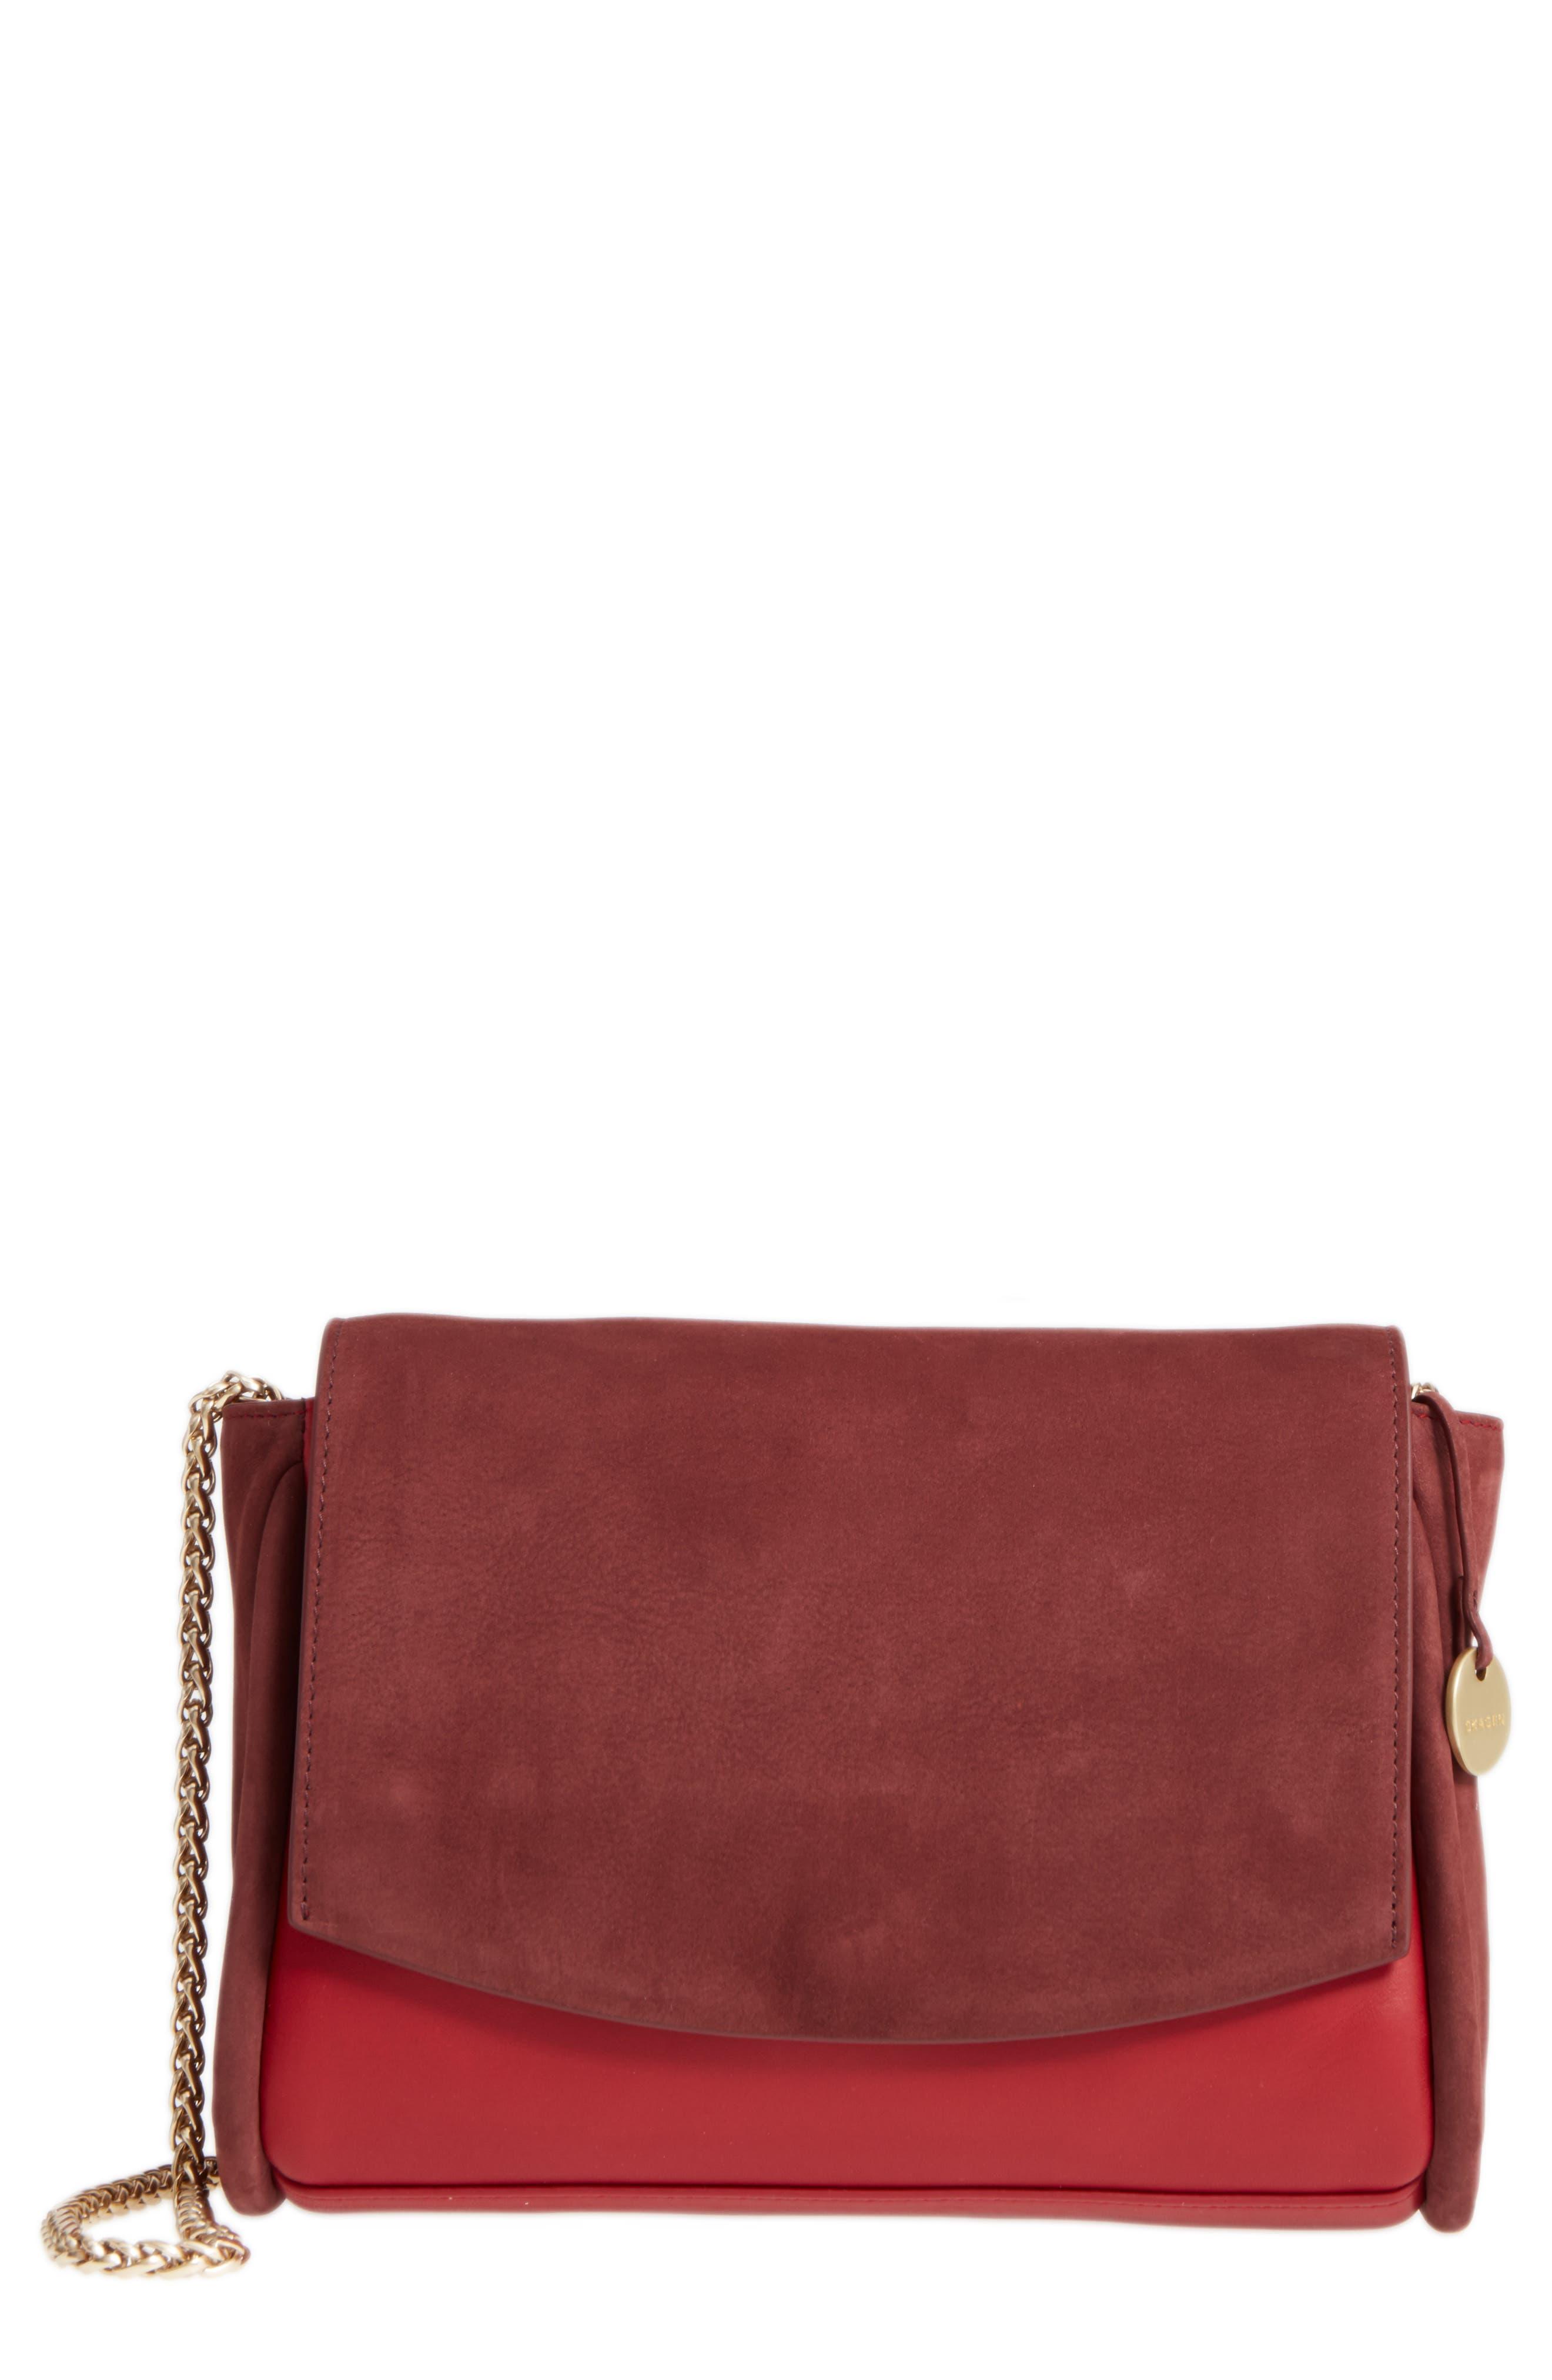 Alternate Image 1 Selected - Skagen Sylvi Leather Crossbody Bag